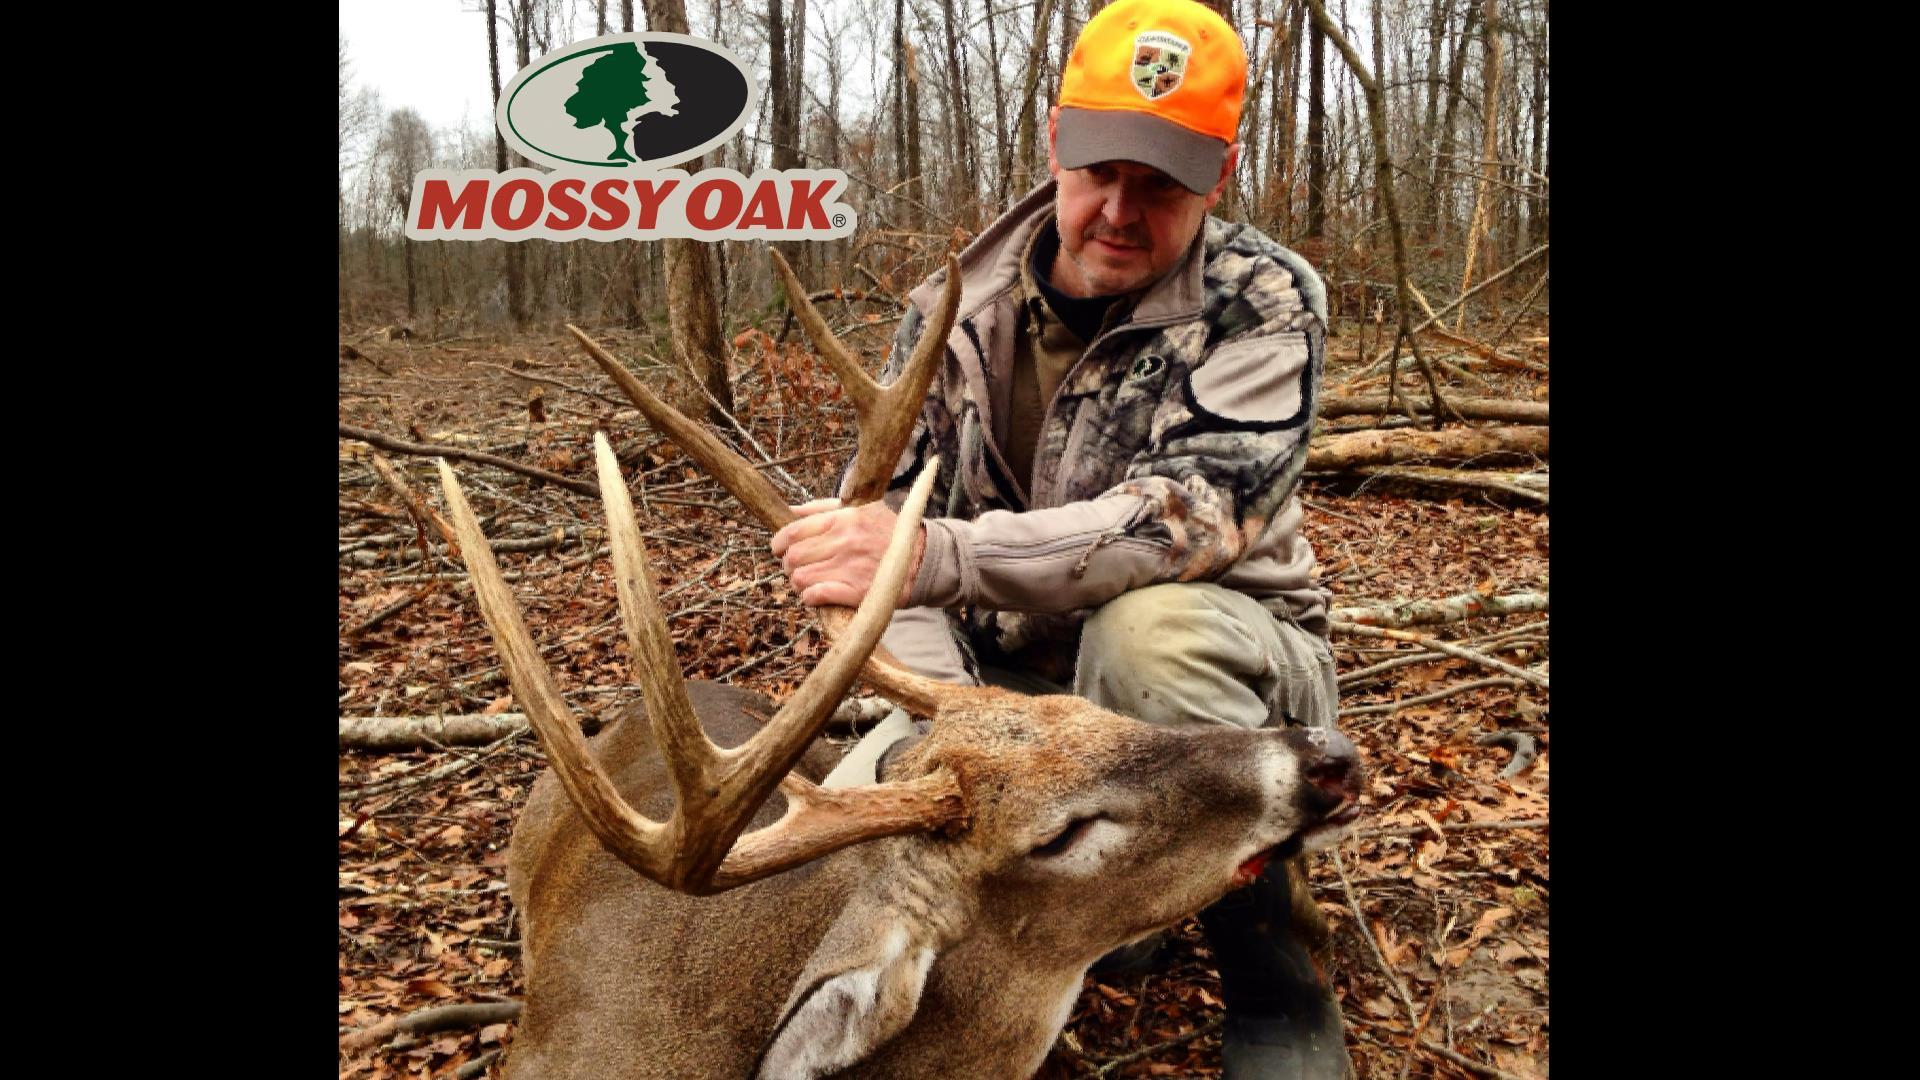 Artwork for Habitat Podcast #52 - Bobby Cole - Mossy Oak GameKeepers, Food Plot Future, Biologic, Foliar Fertilizer, Habitat Innovation, Down South Hunting, Tilling or No Till, Plot Strategy, Favorite Seed Blends & Hunting with Kids